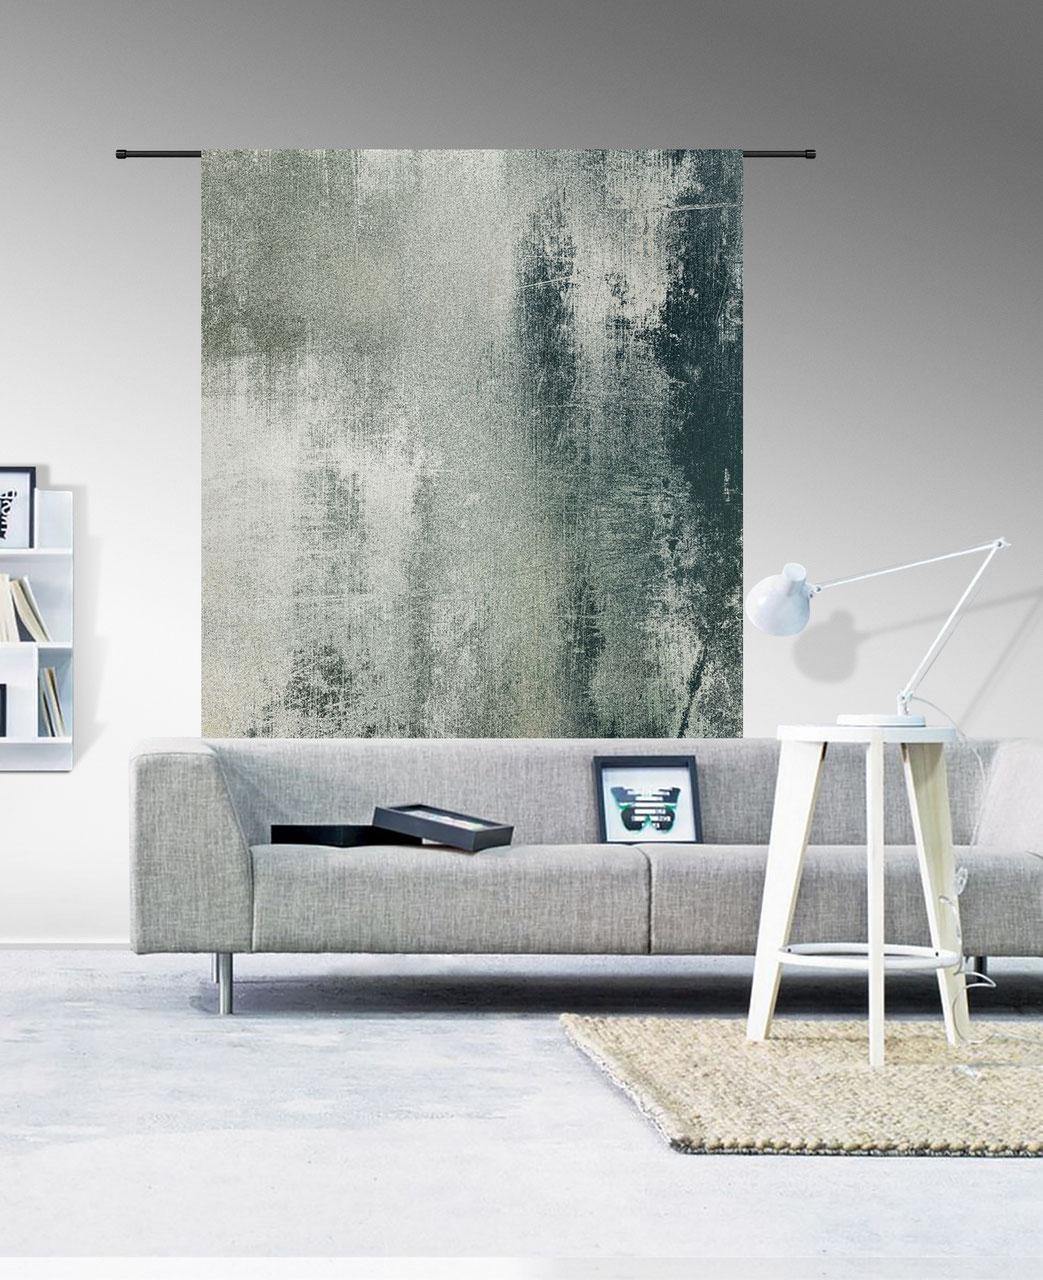 wandkleed grunge. Black Bedroom Furniture Sets. Home Design Ideas